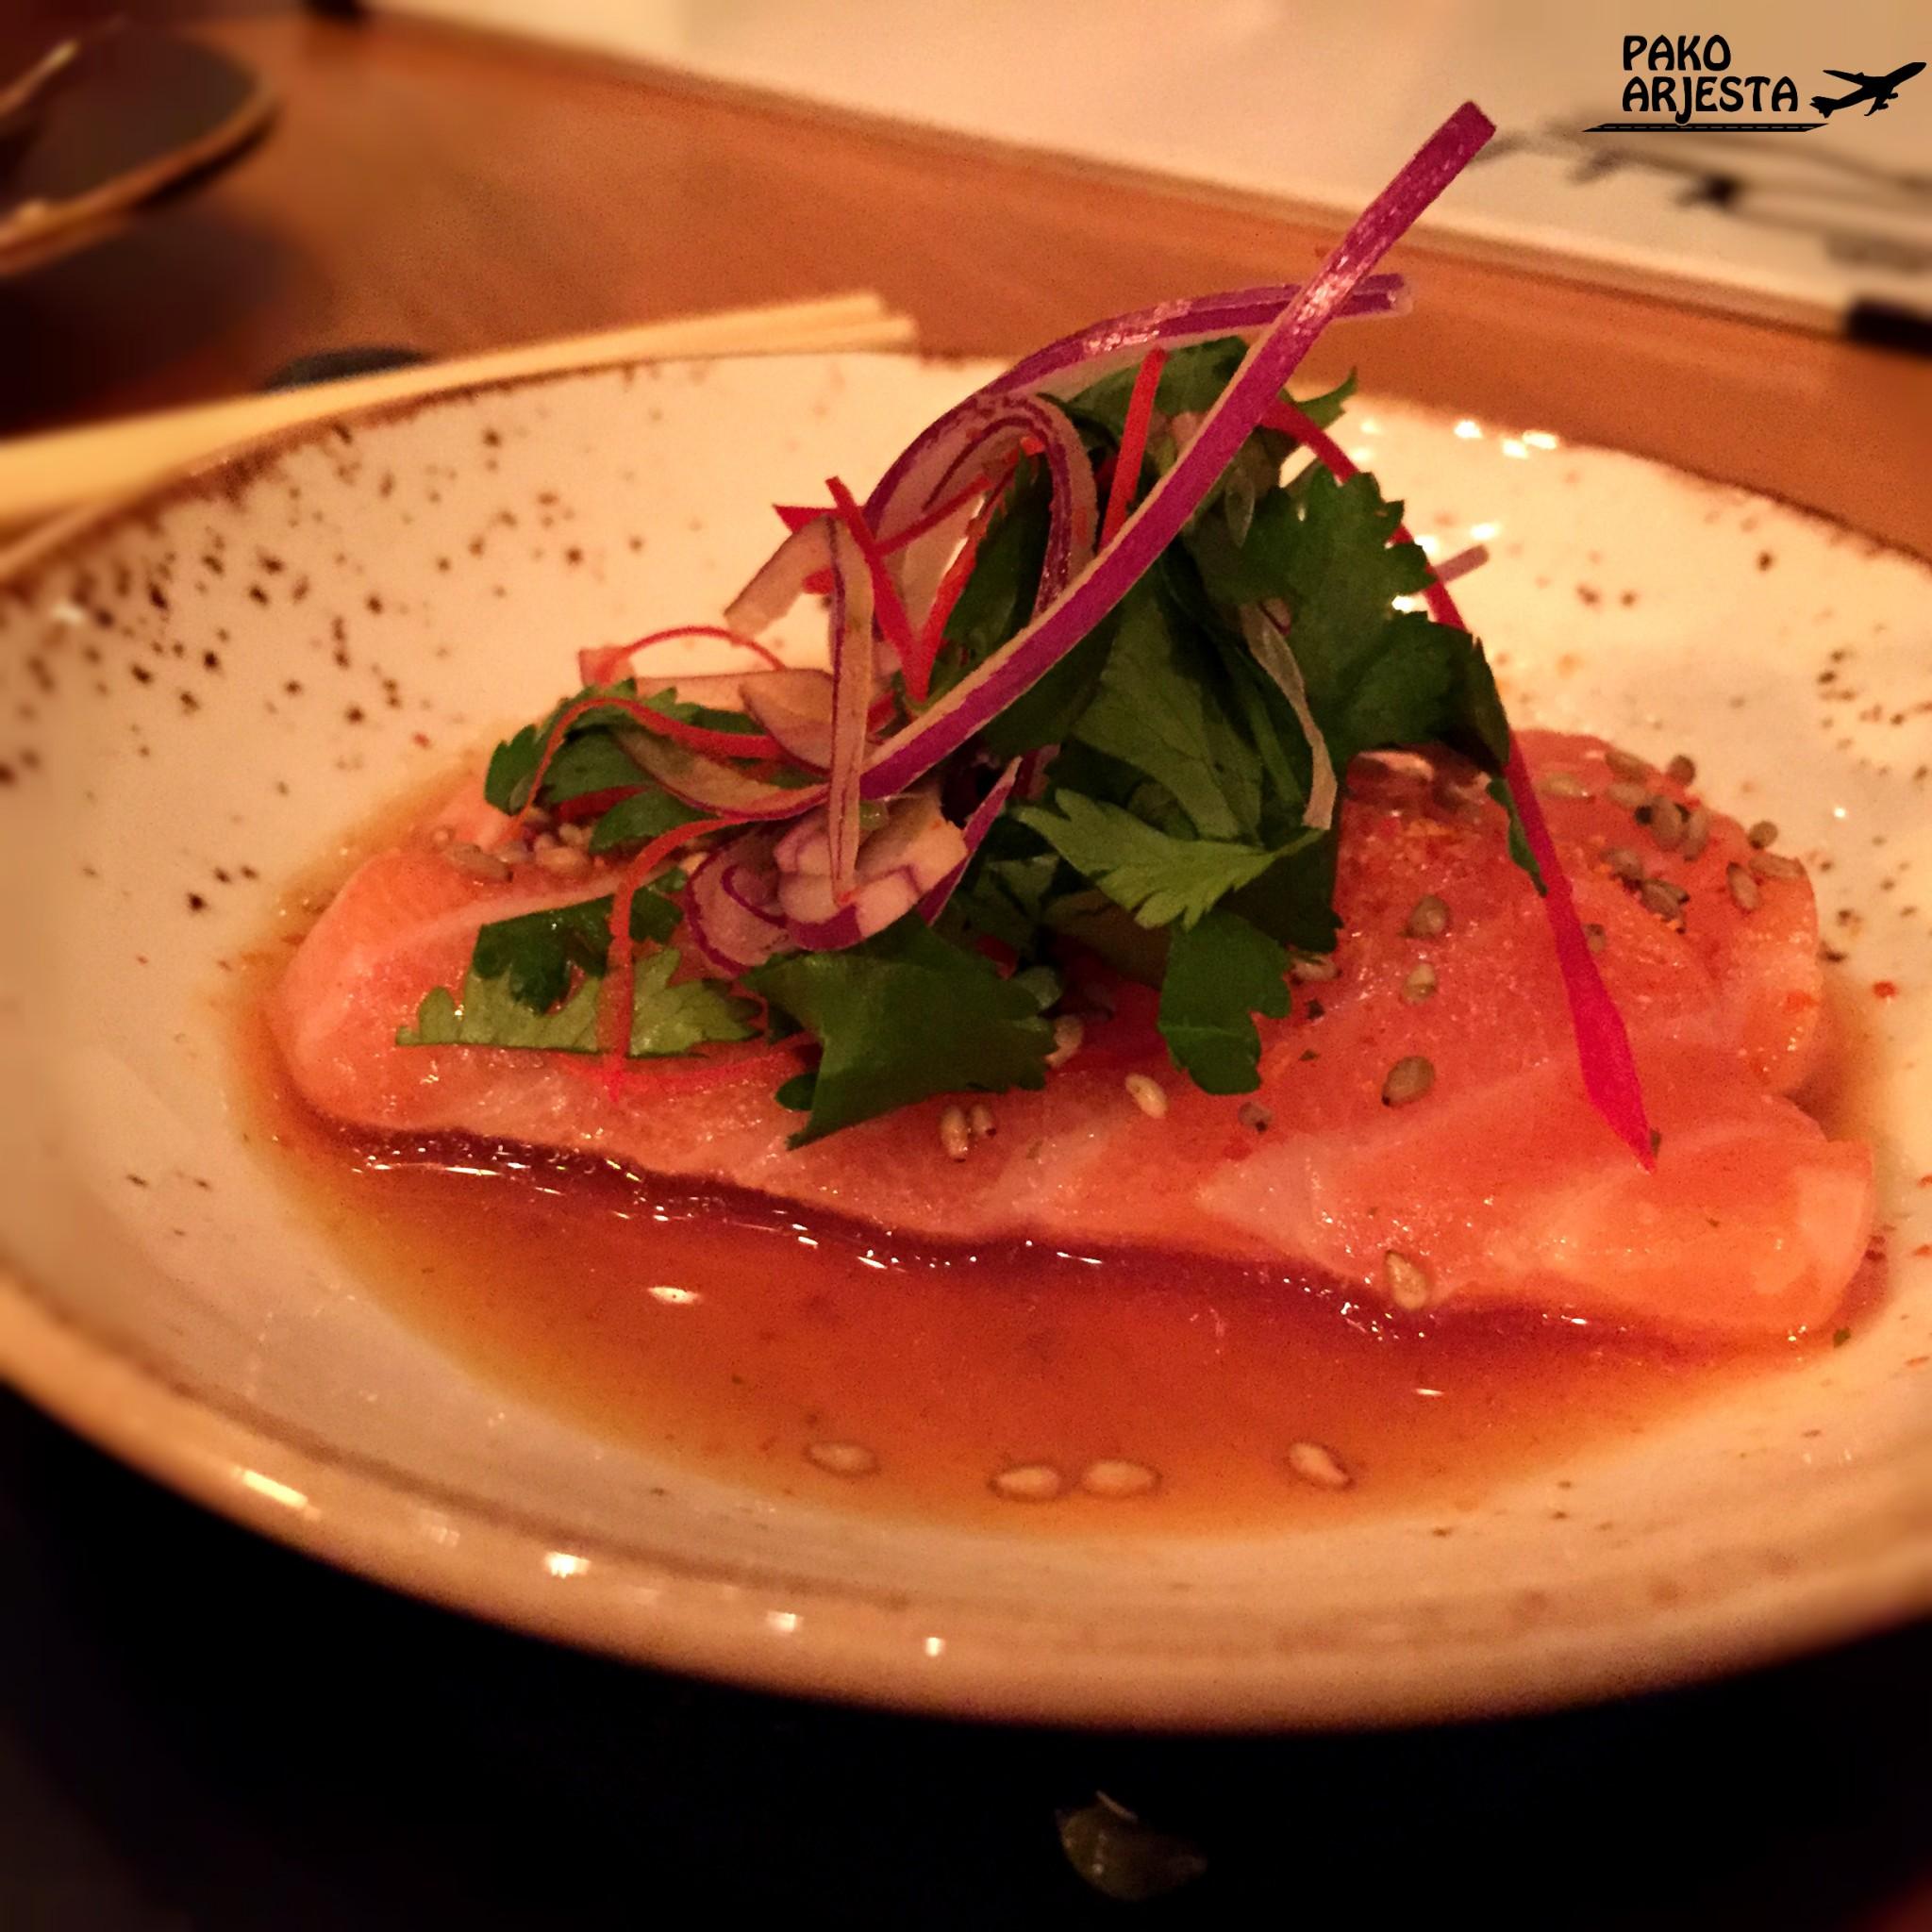 Yume sashimi